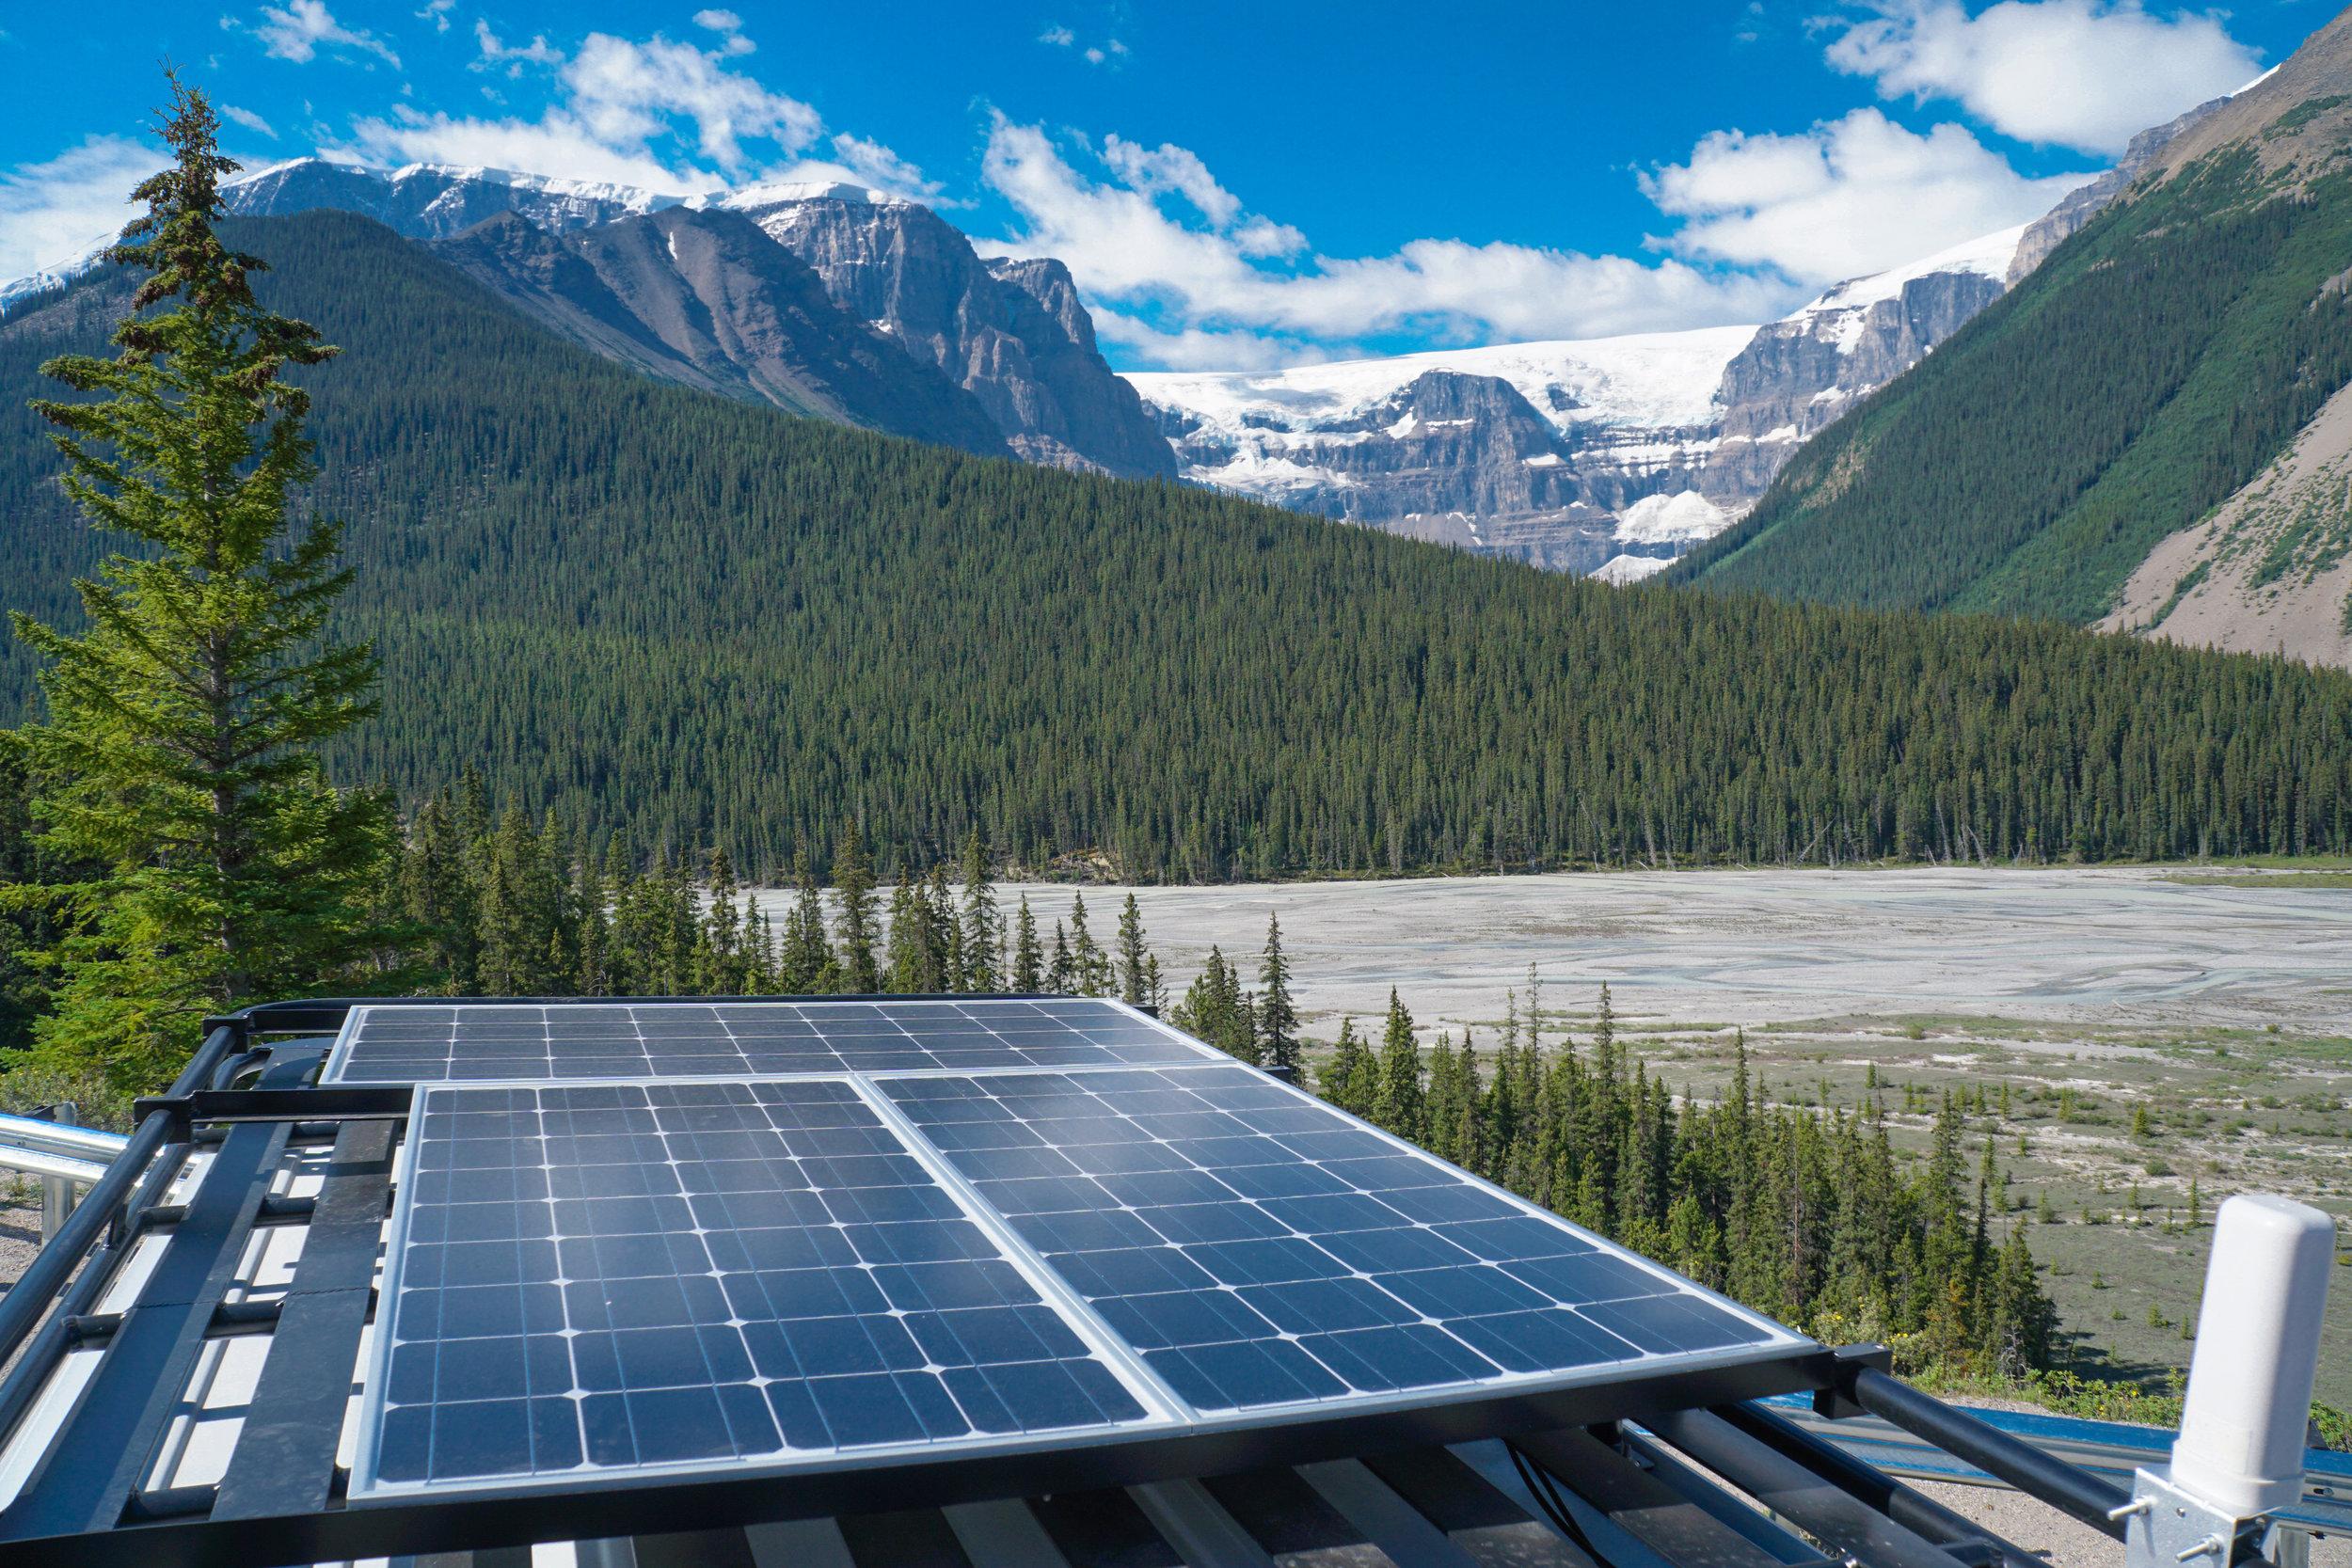 mercedes sprinter camper van conversion solar panel renogy mount aluminess rack jasper national park